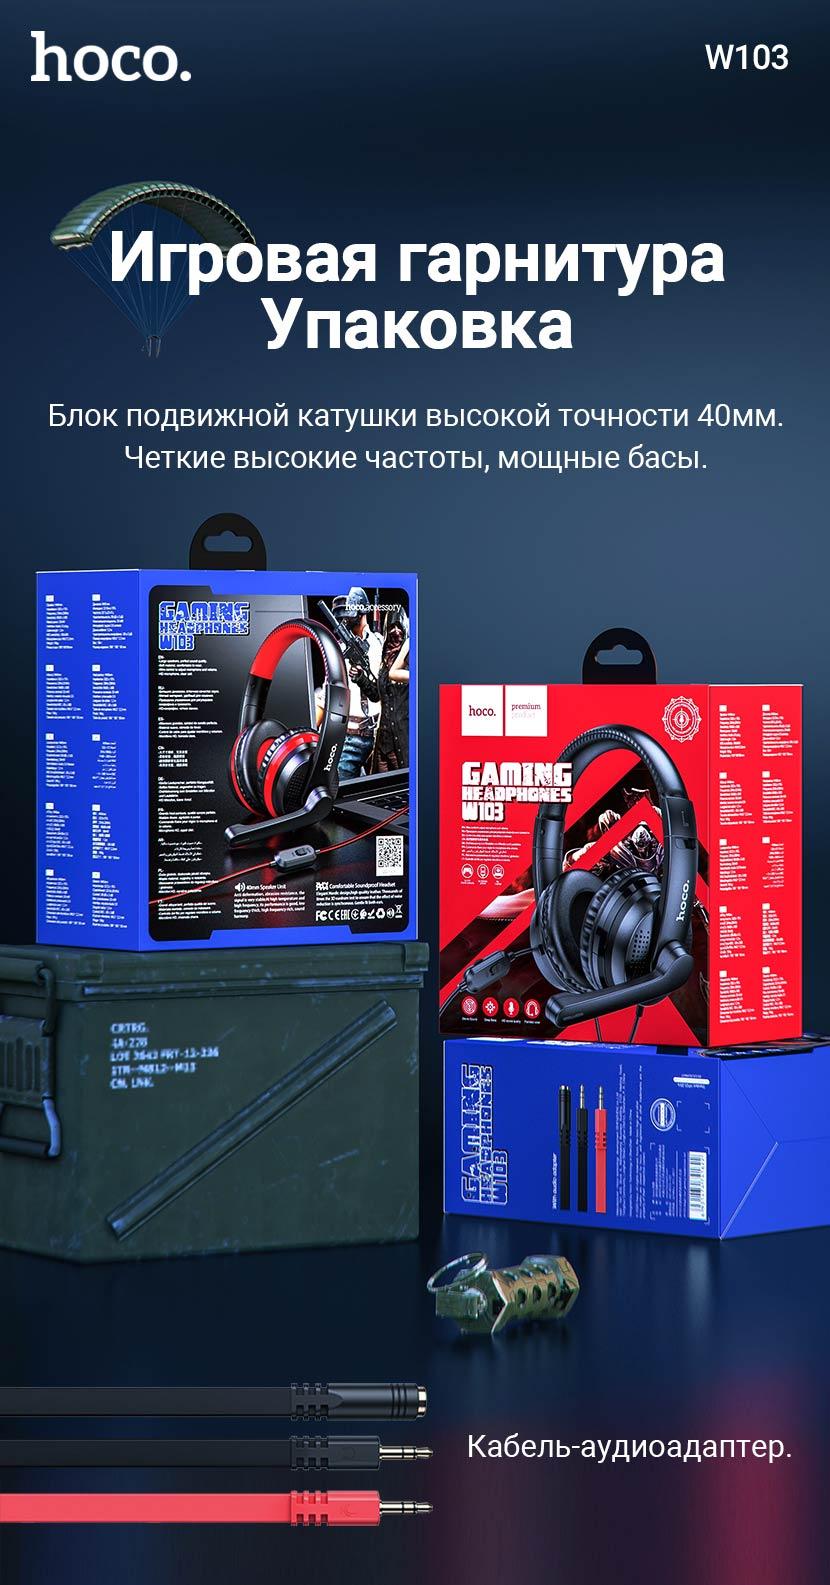 hoco news w103 magic tour gaming headphones package ru